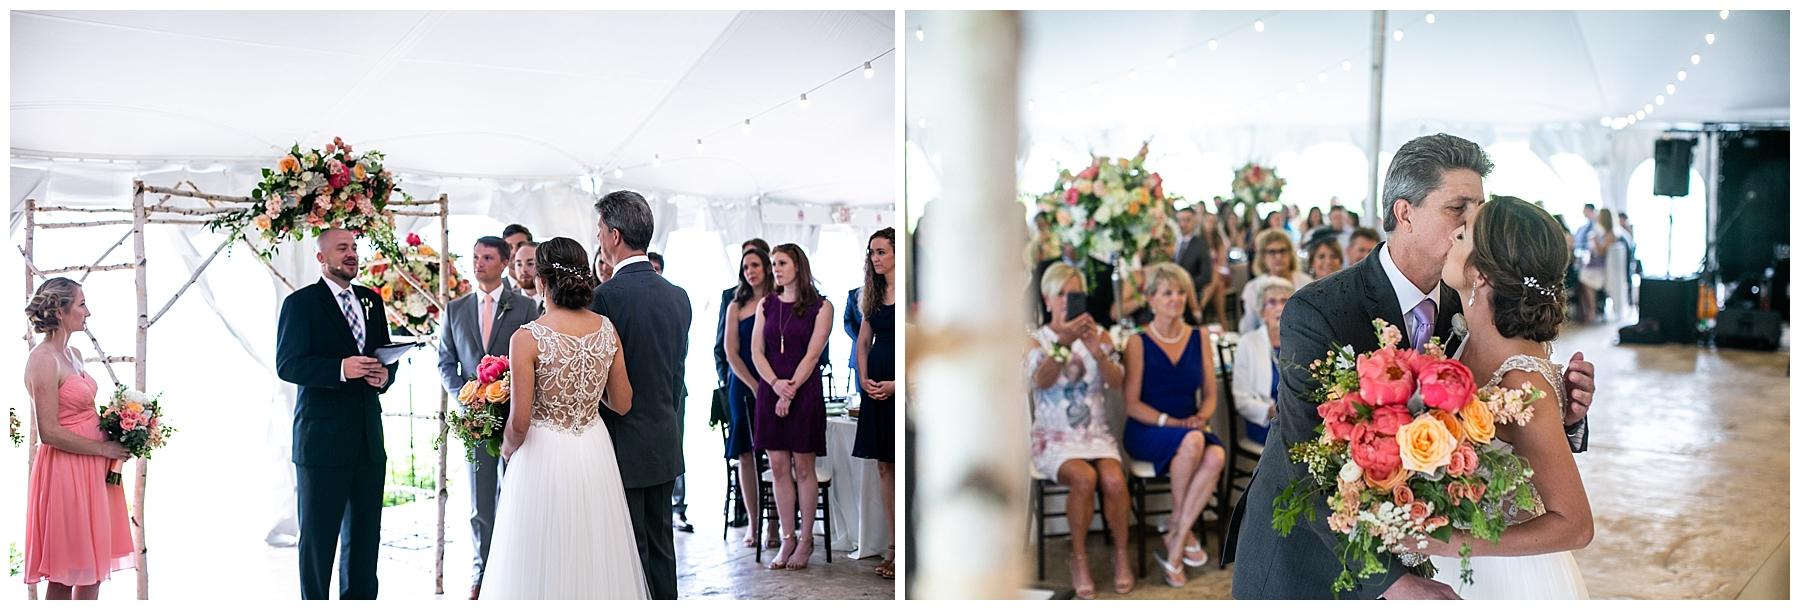 Chelsea Phil Bohemia River Overlook Wedding Living Radiant Photography photos_0105.jpg